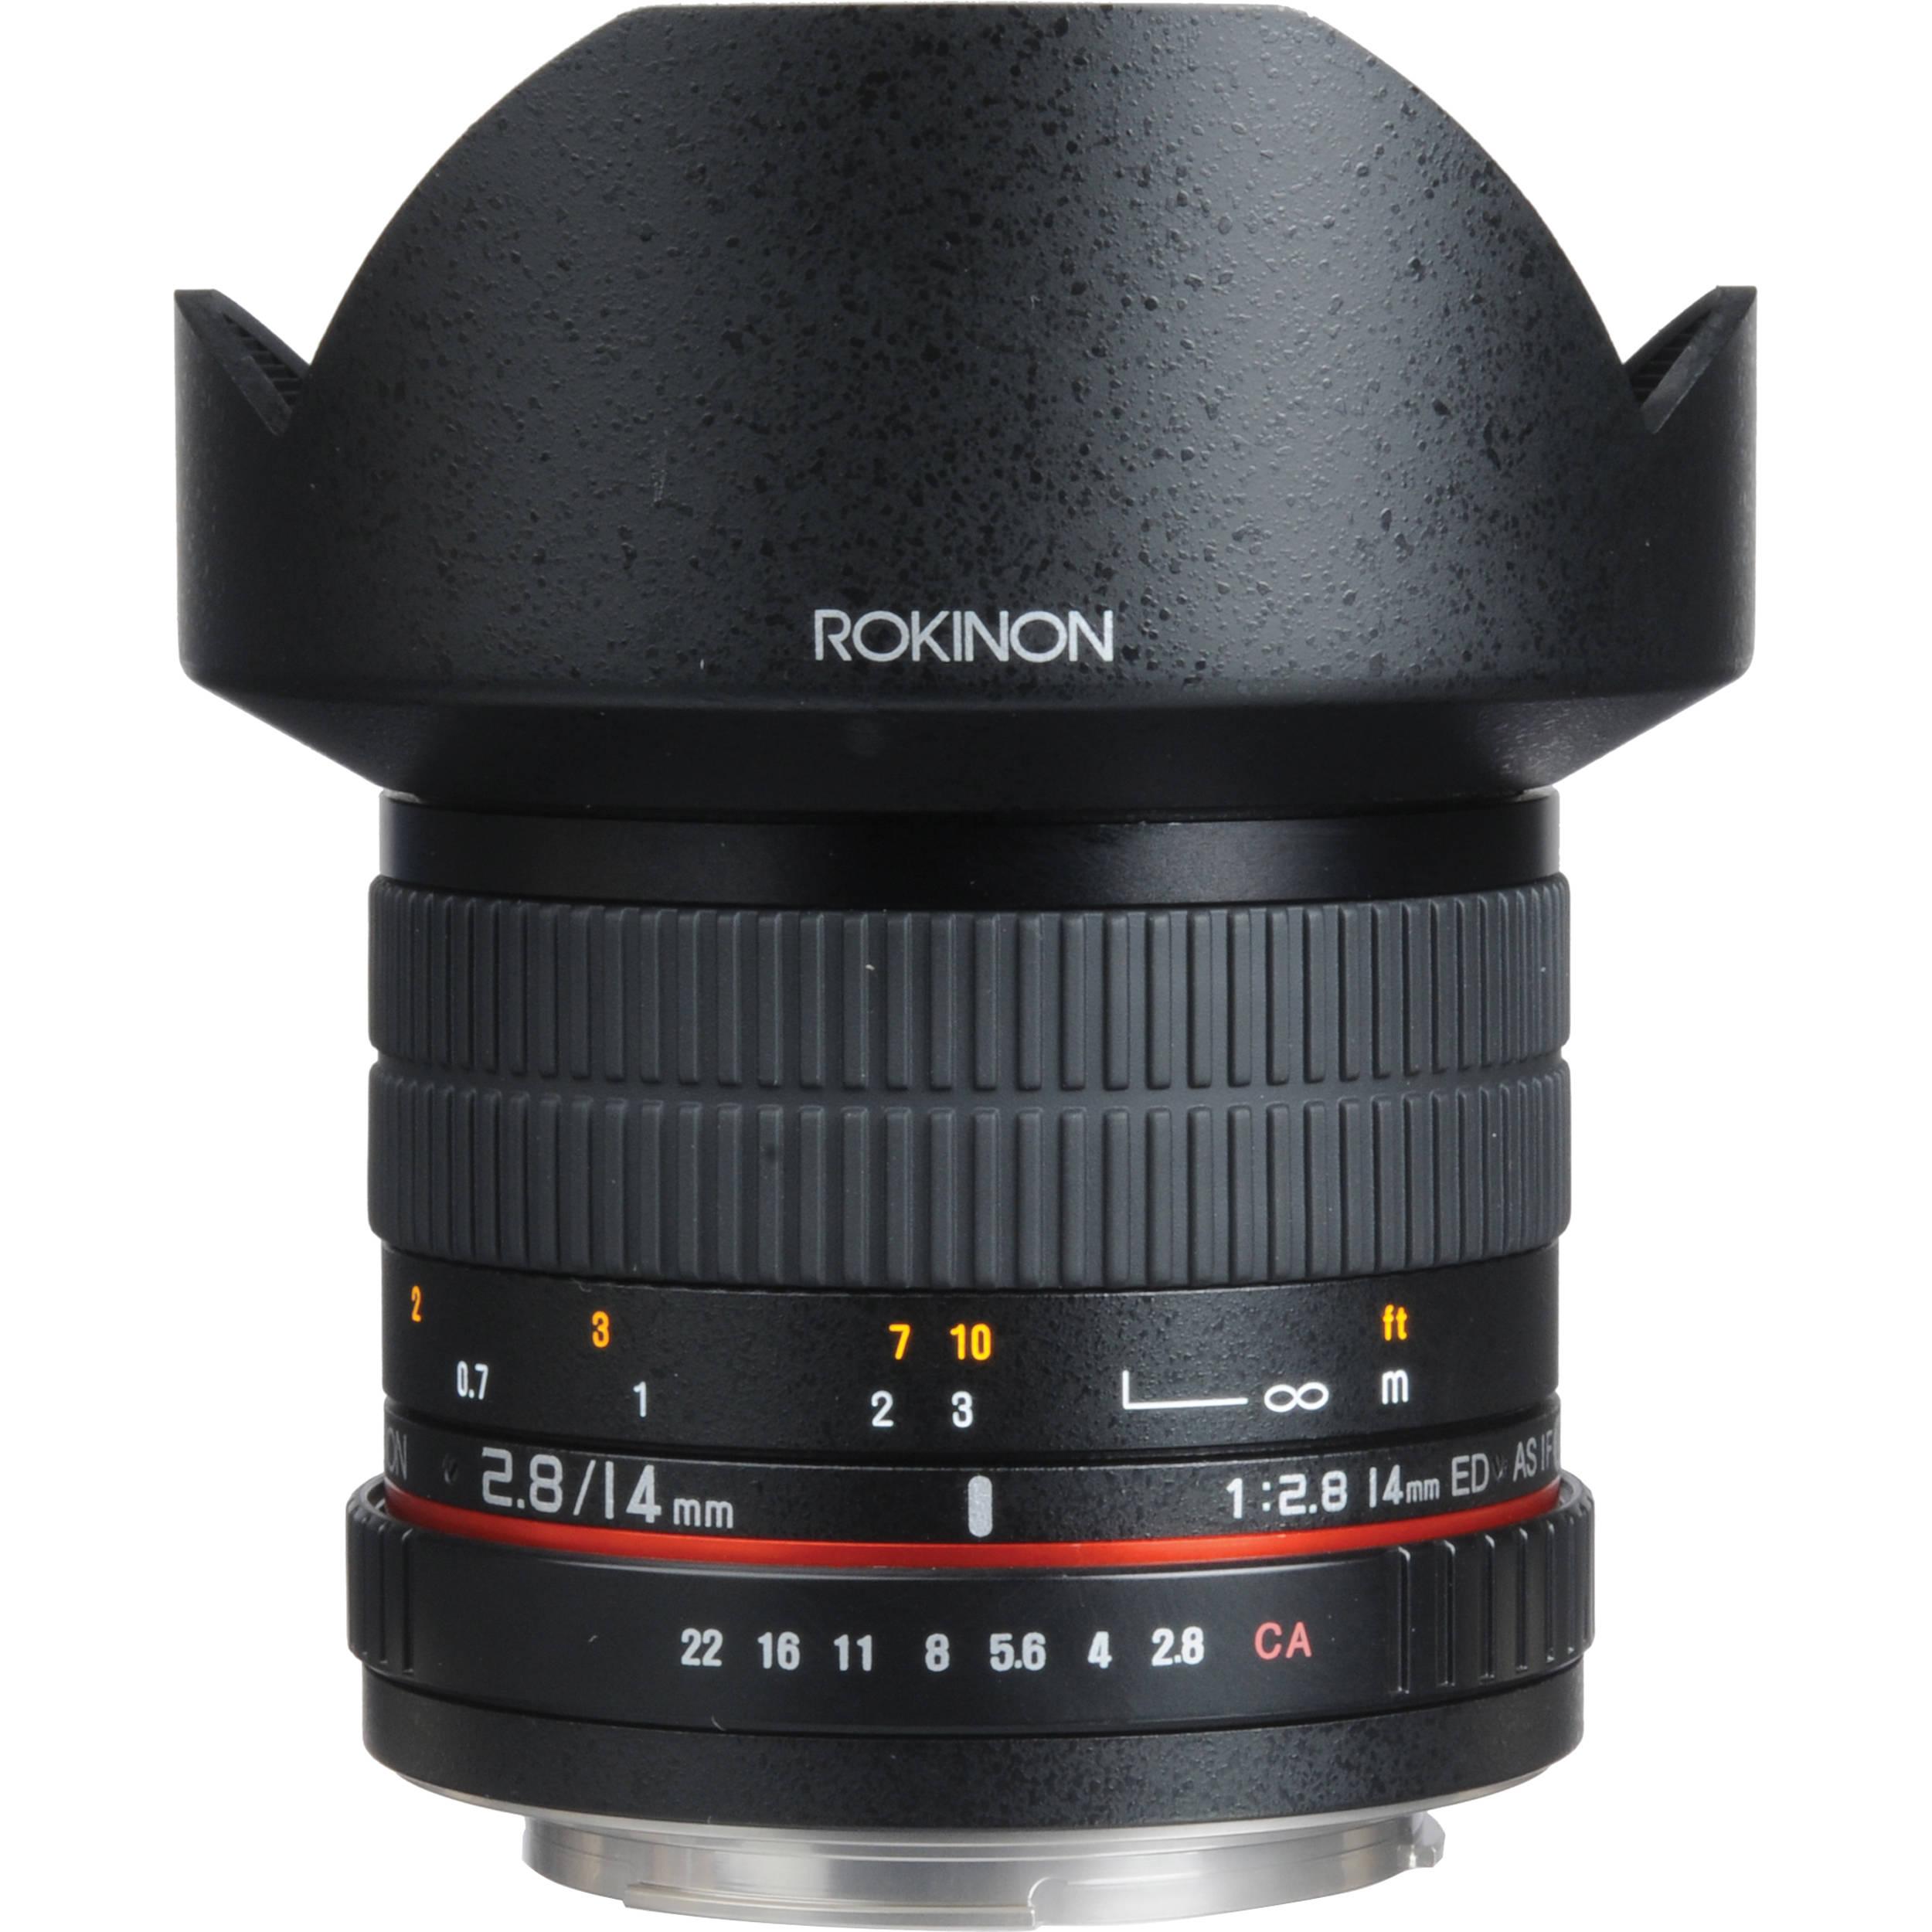 Rokinon 14mm F 2 8 If Ed Umc Lens For Sony A Fe14m S B Amp H Photo